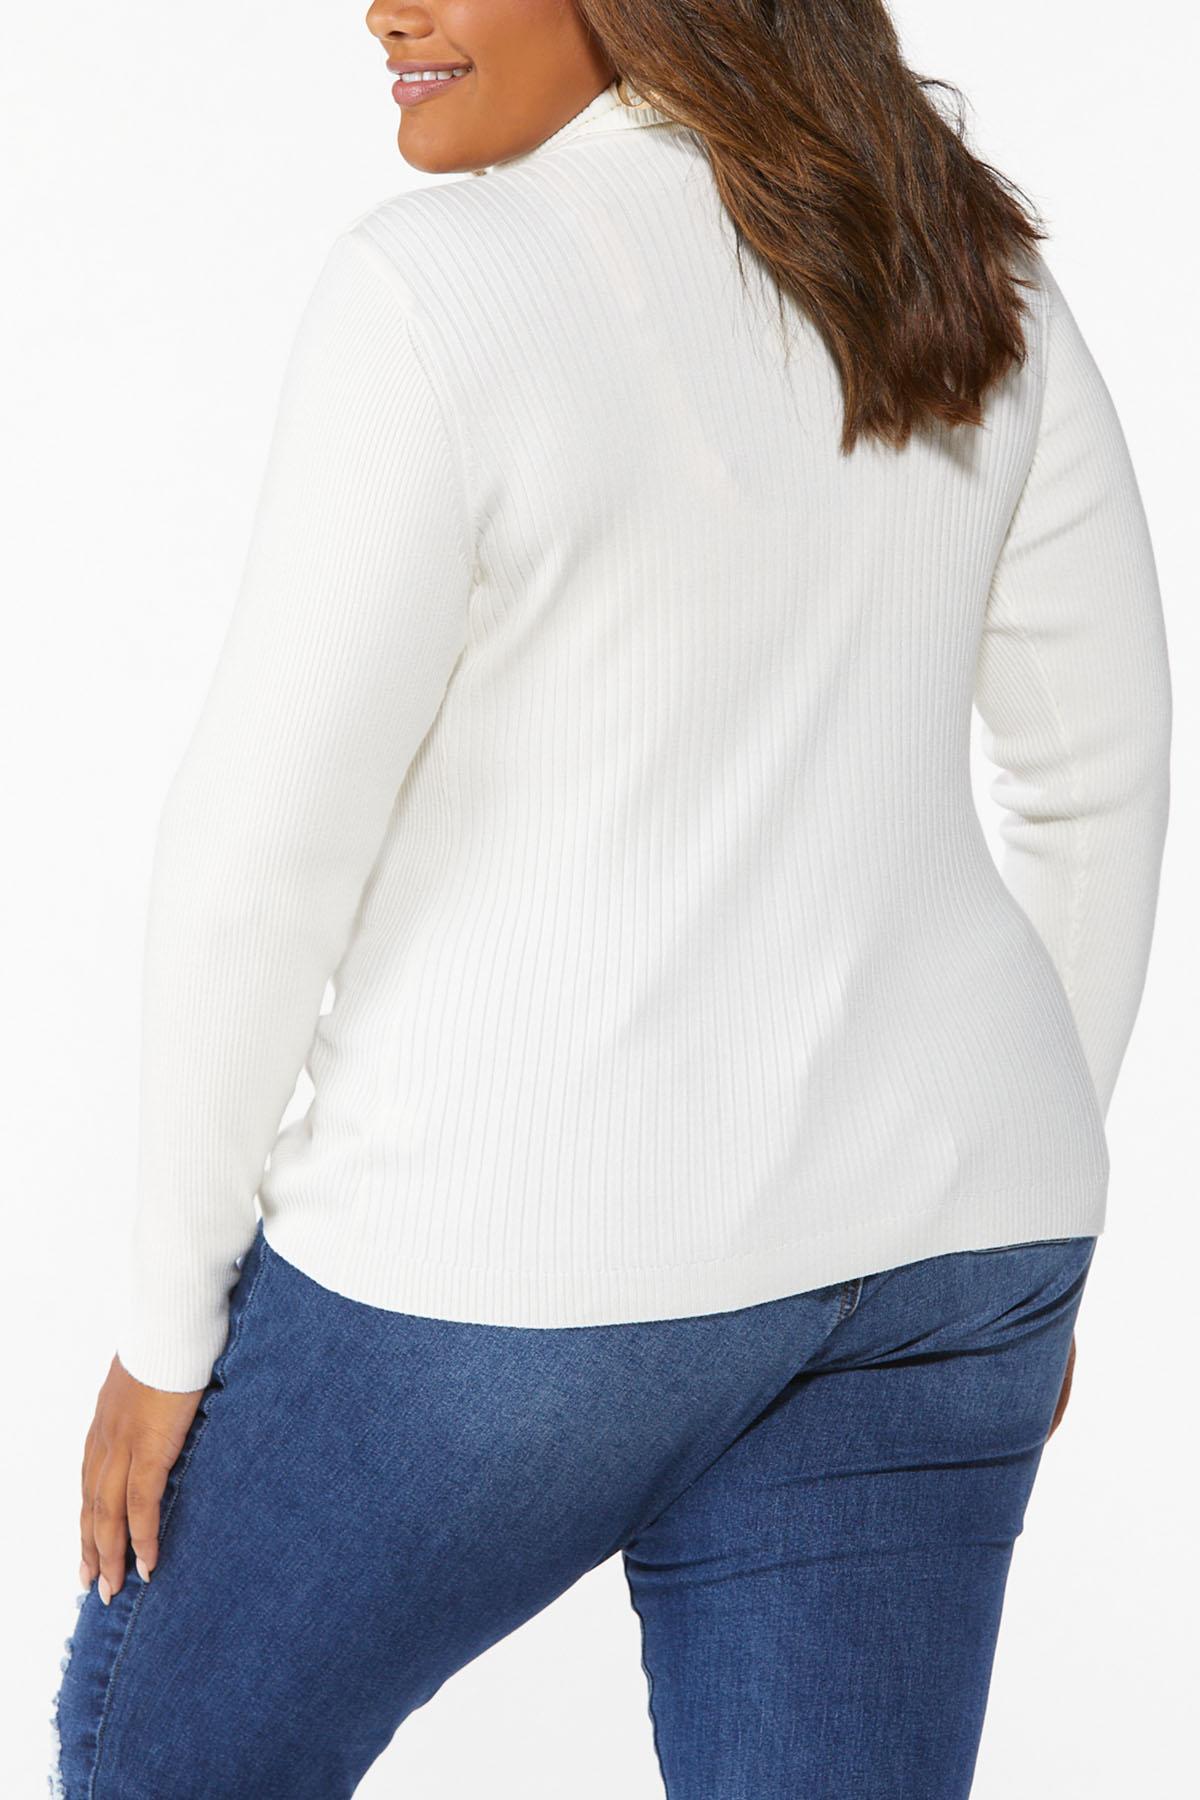 Plus Size Ribbed Turtleneck Sweater (Item #44646998)